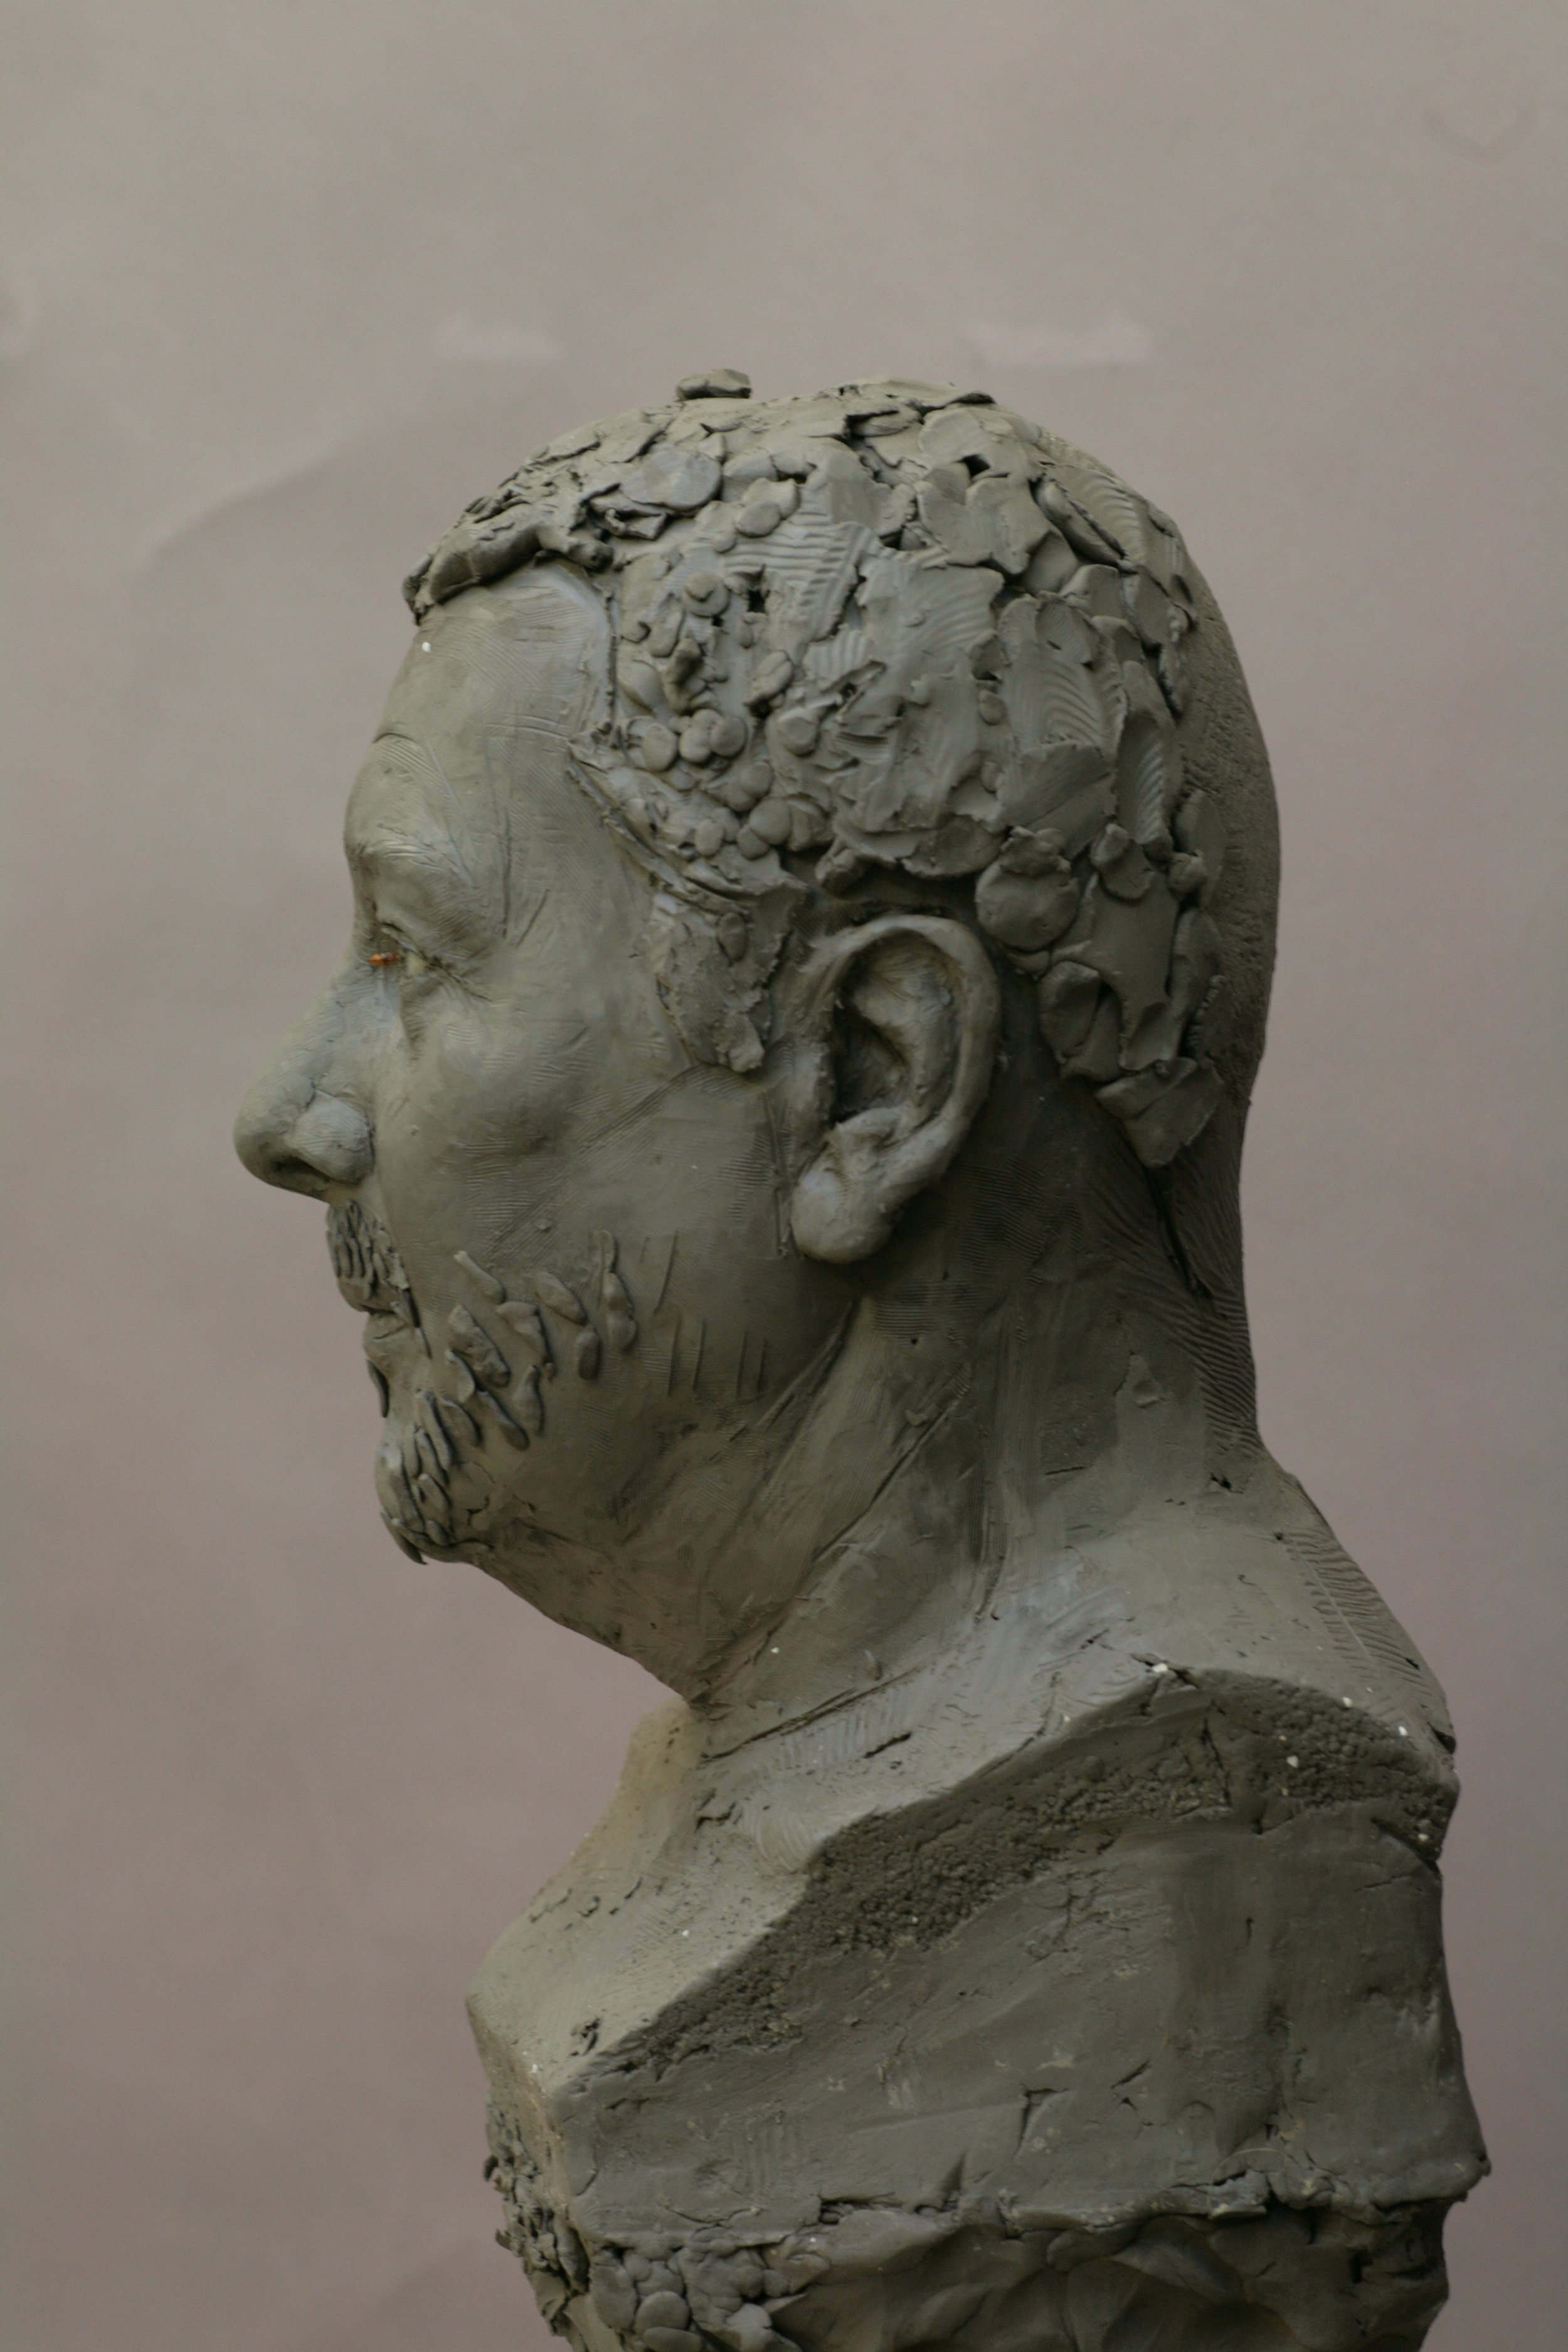 Philippe Starck - Clay sculpture by Eric Saint Chaffray - Credit Musée Grévin